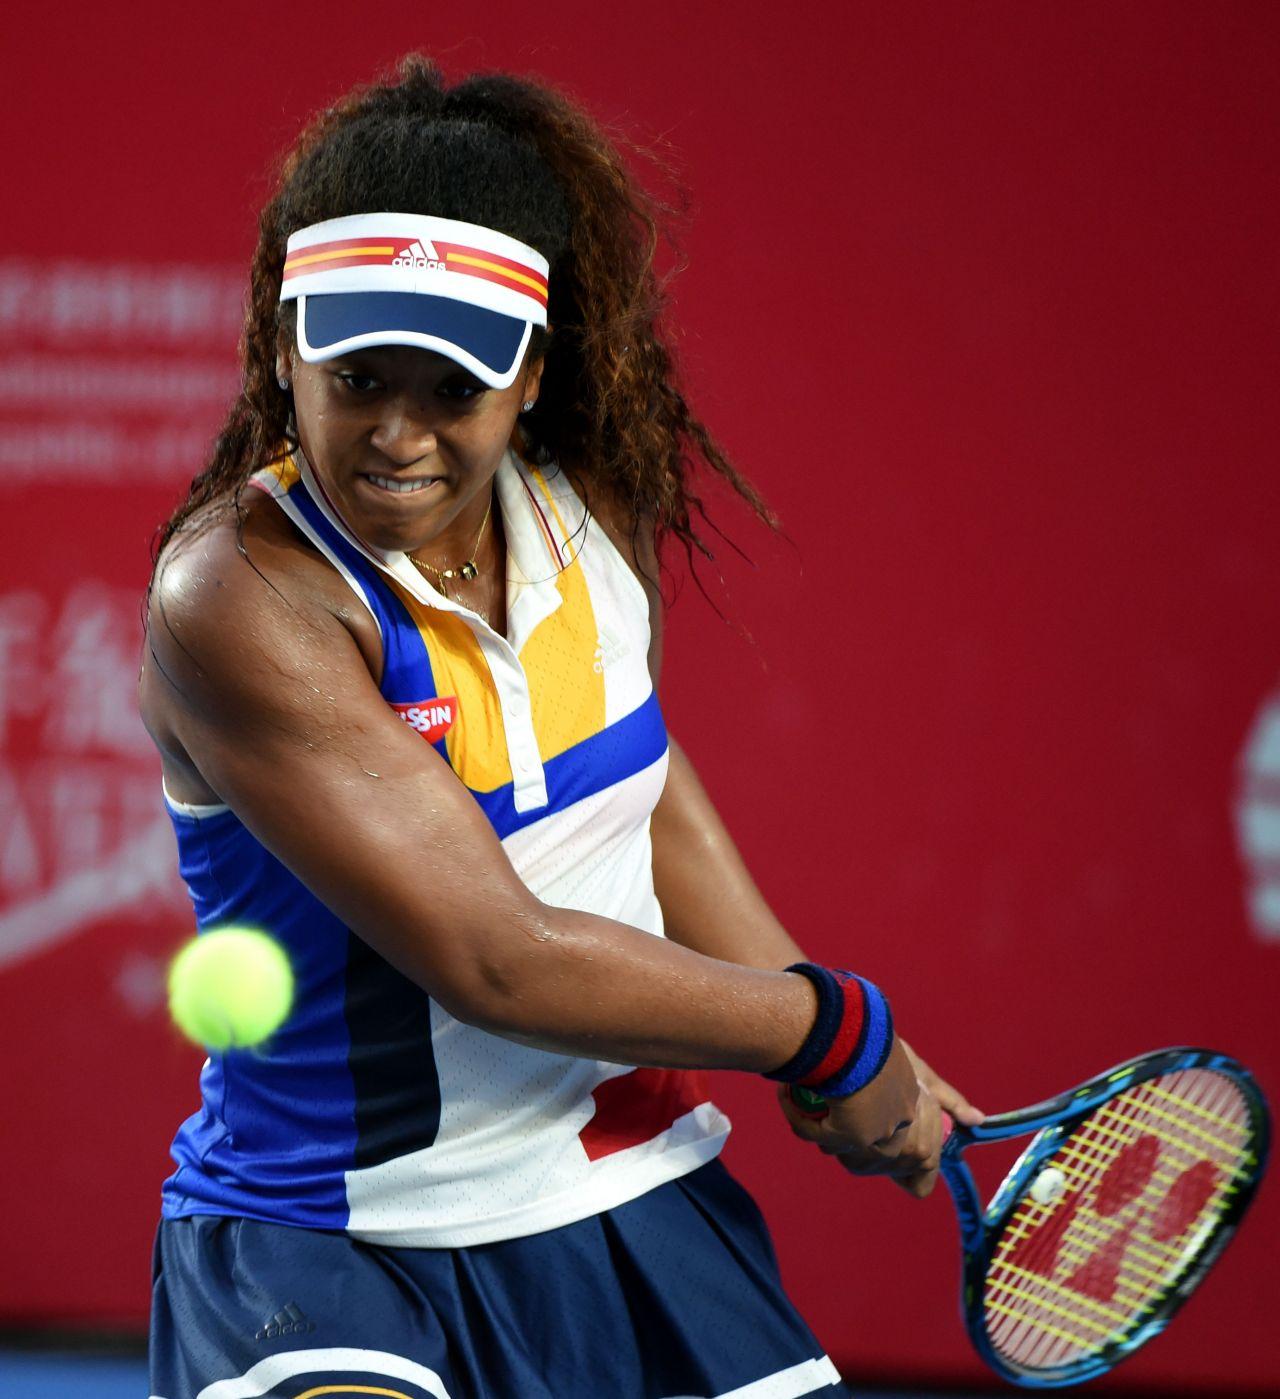 Naomi Osaka – 2017 WTA Hong Kong Tennis Open in Hong Kong